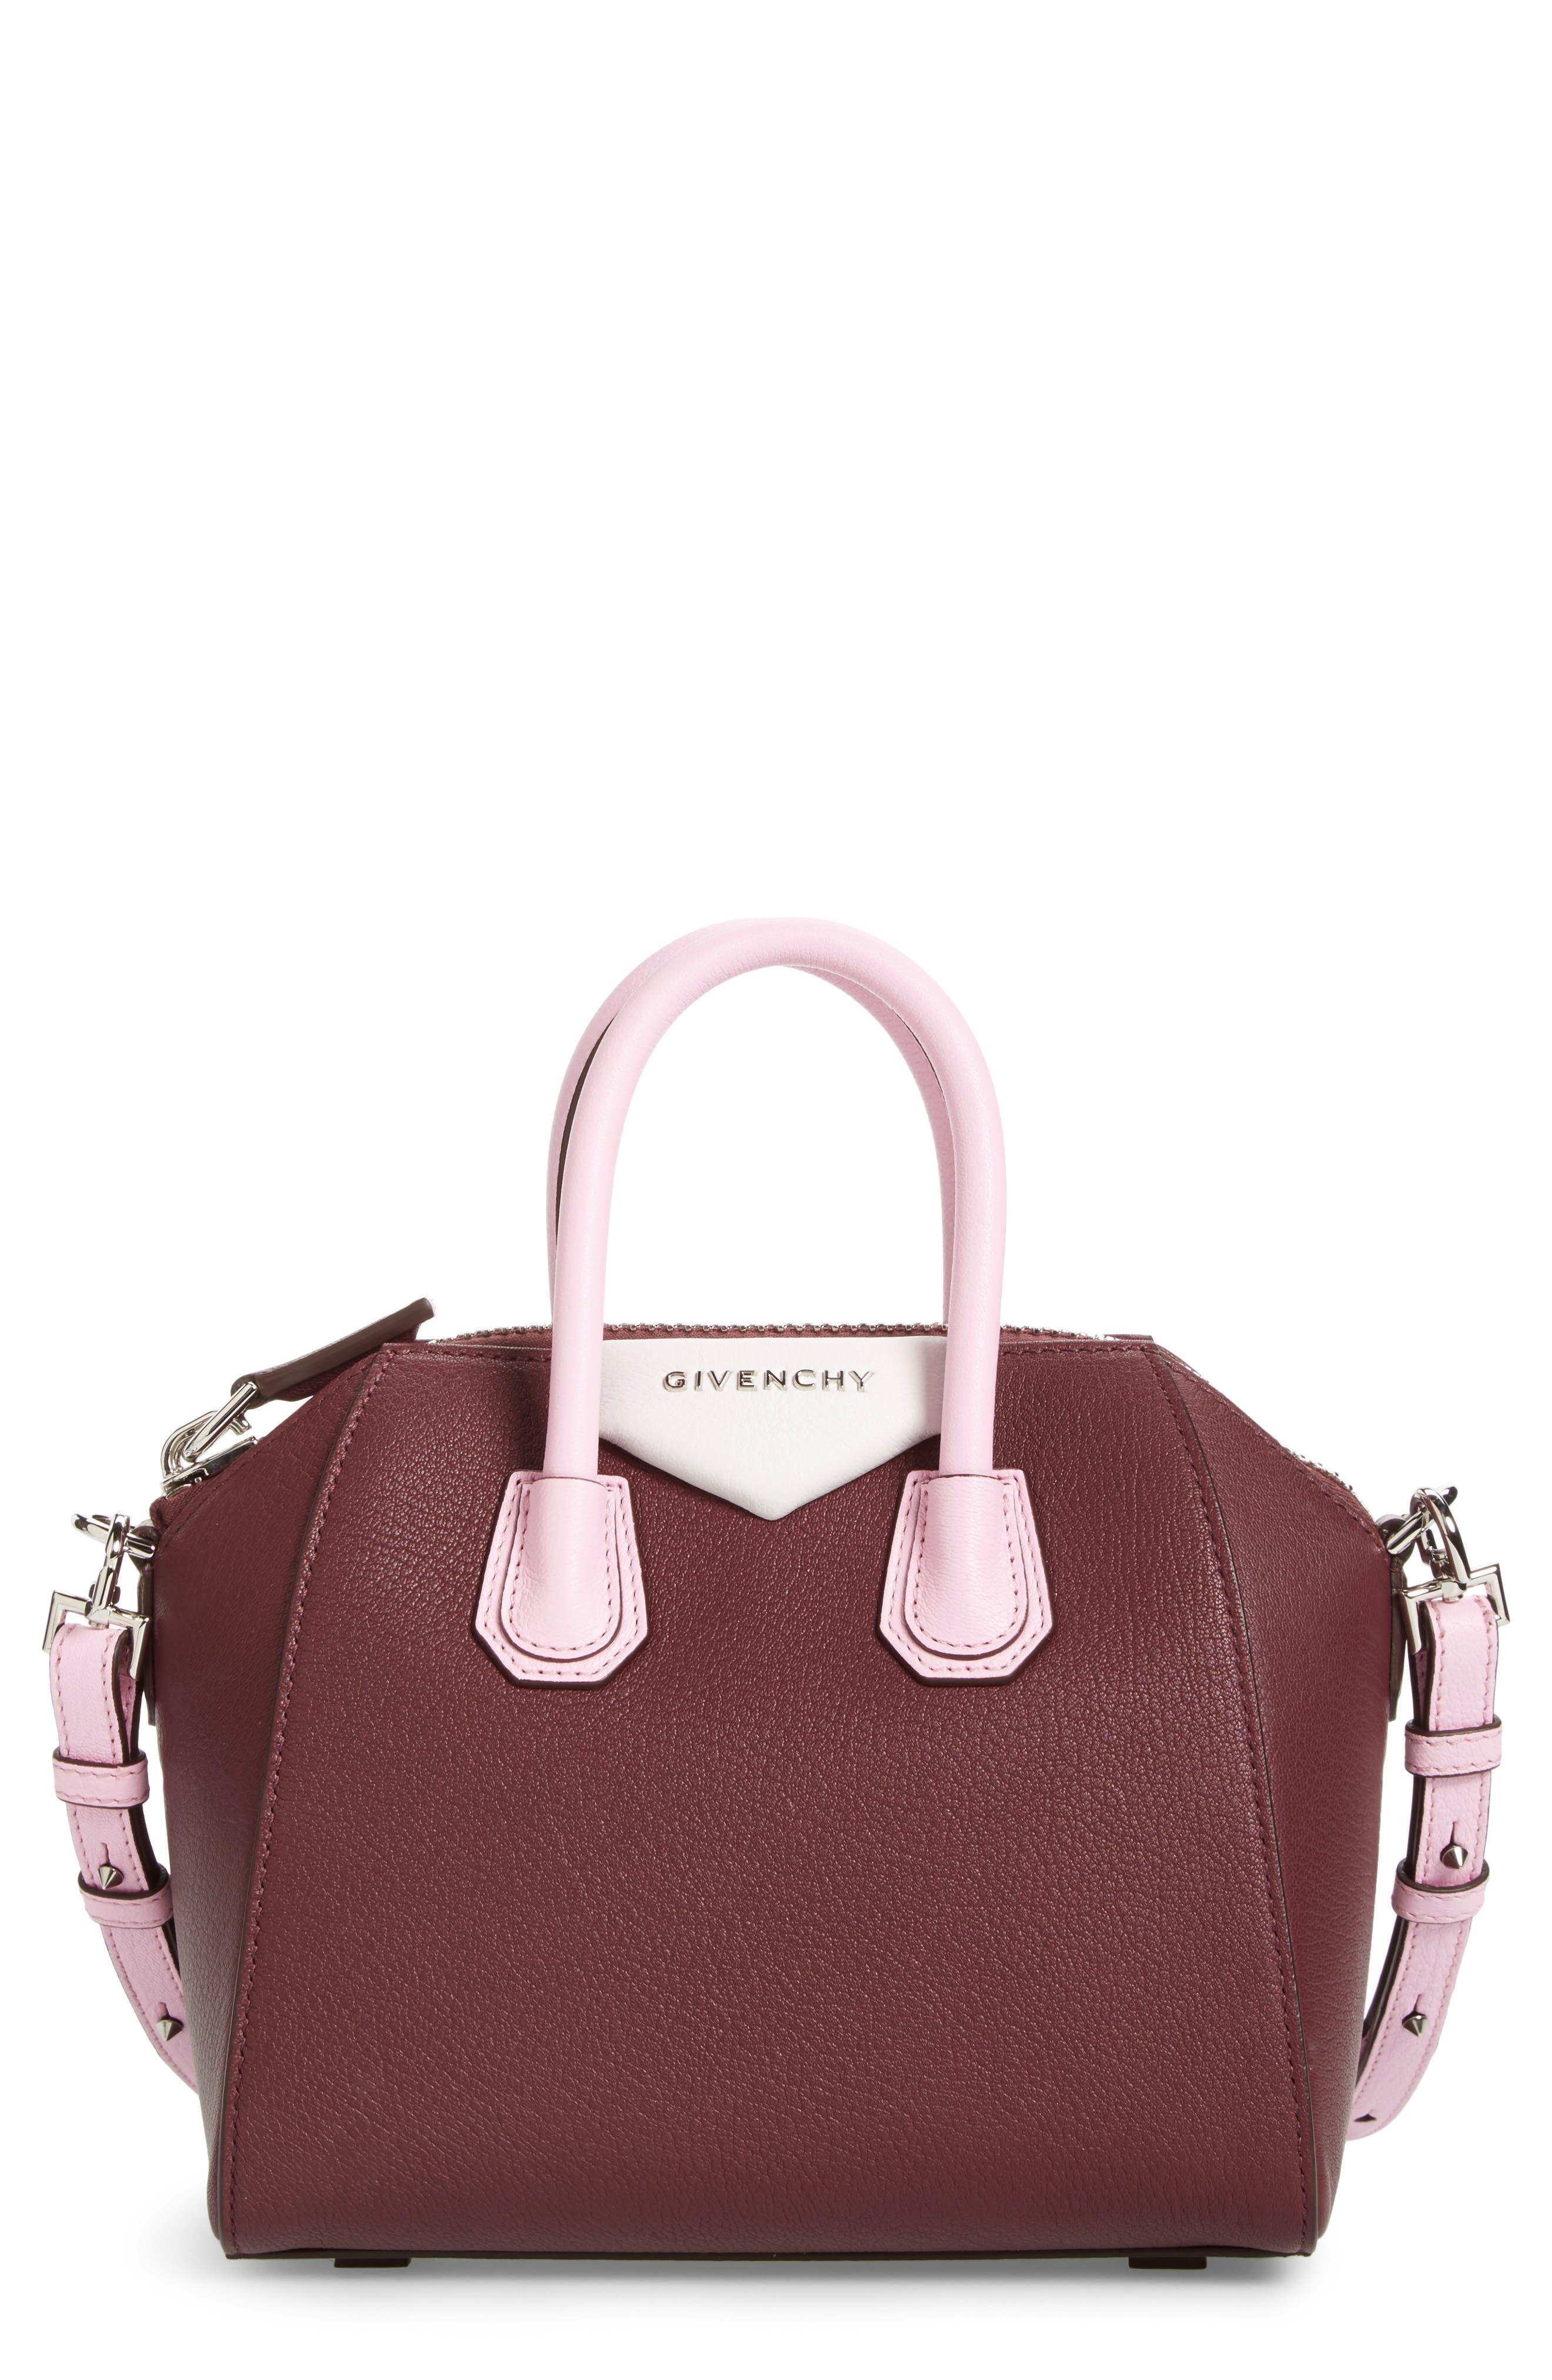 Main Image - Givenchy Mini Antigona Leather Top Handle Satchel